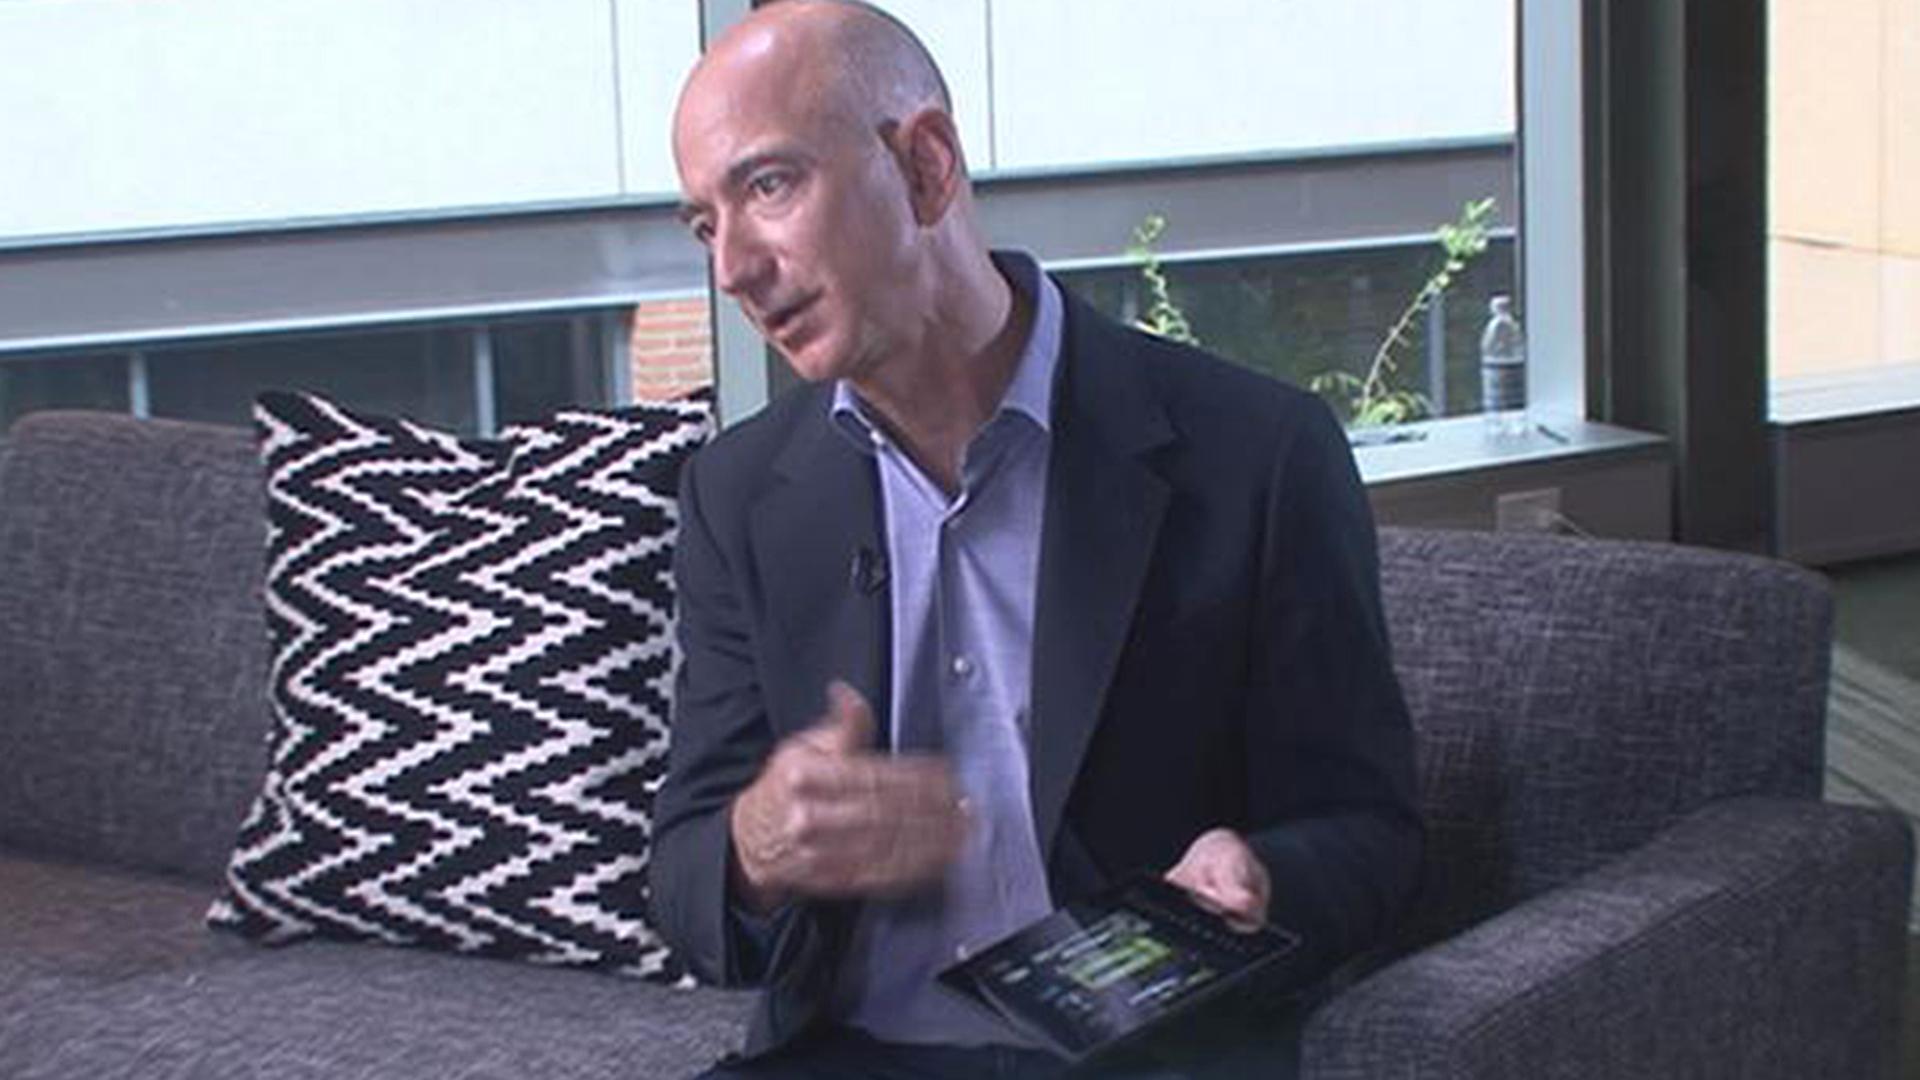 Nbc S Kate Snow Interviews Jeff Bezos